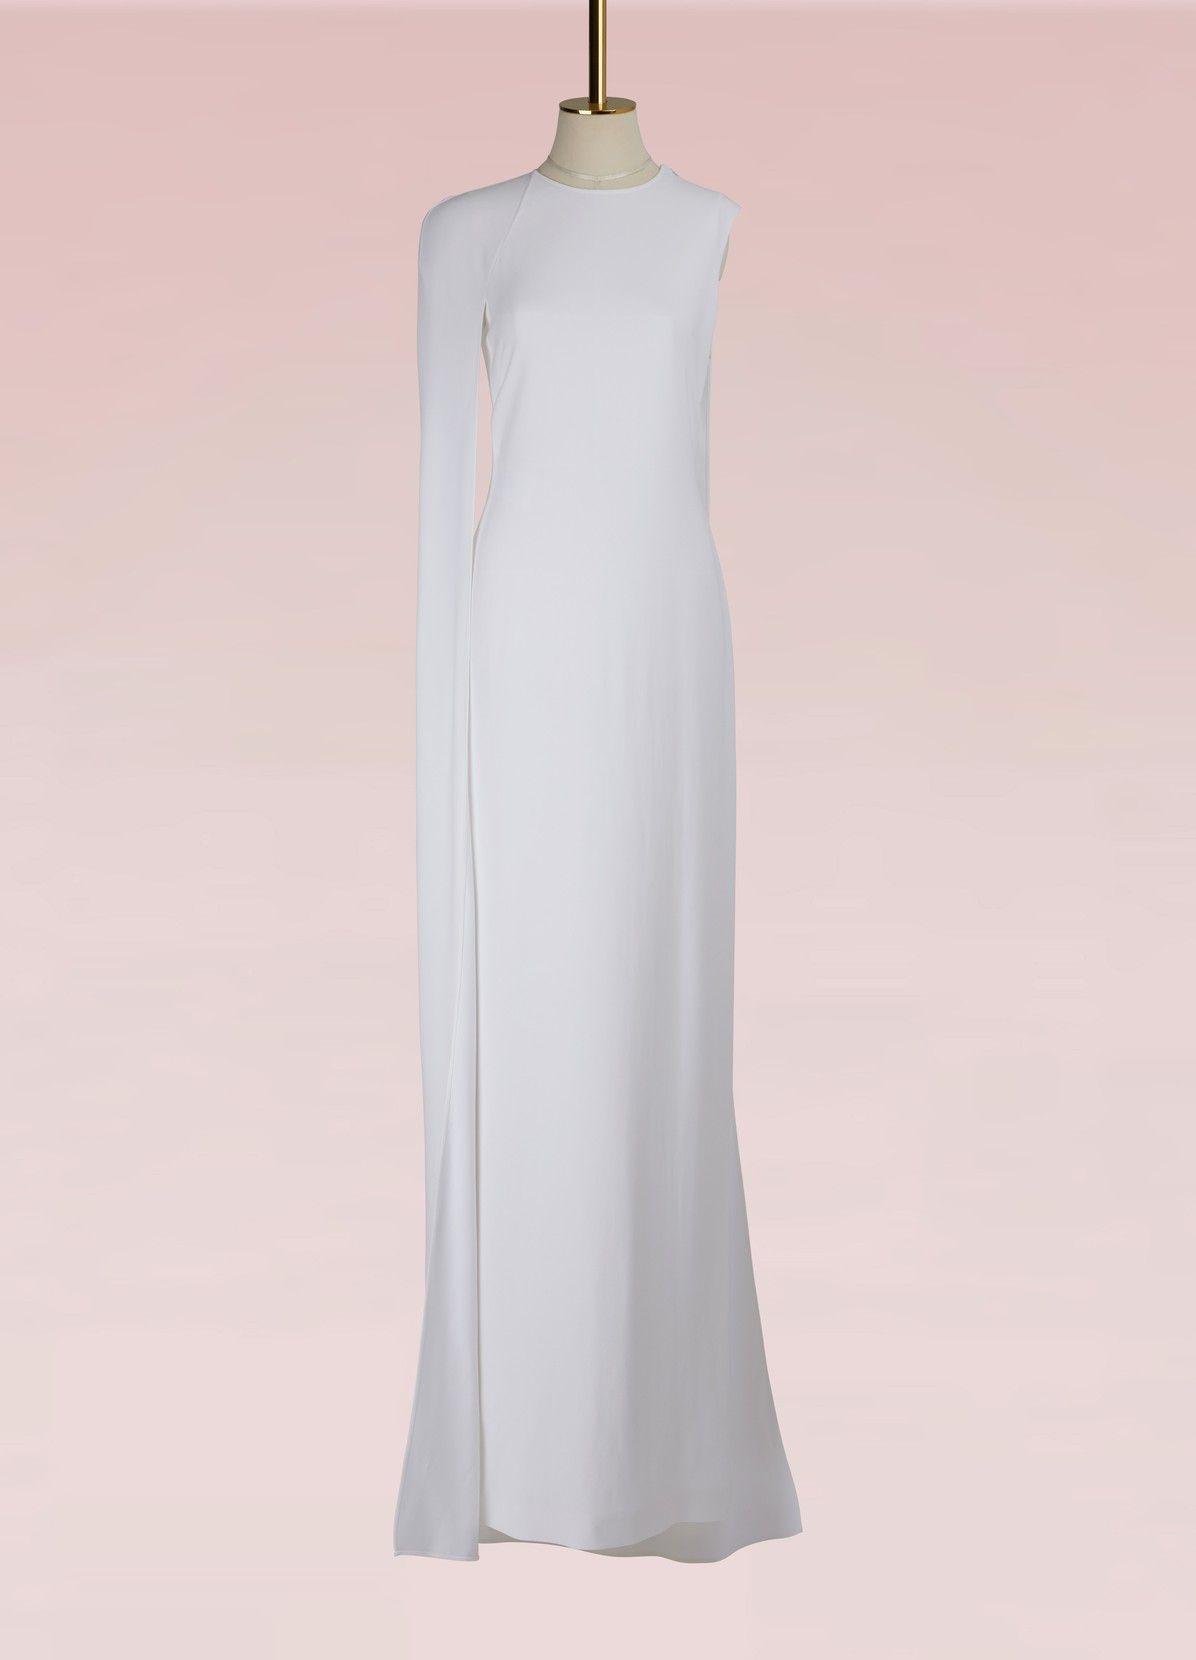 Stella Mccartney Cecilia Cady Stretch Maxi Dress Via 24 Sevres Worldwide Shipping Dresses Maxi Dress Maxi Dress Online [ 1660 x 1196 Pixel ]